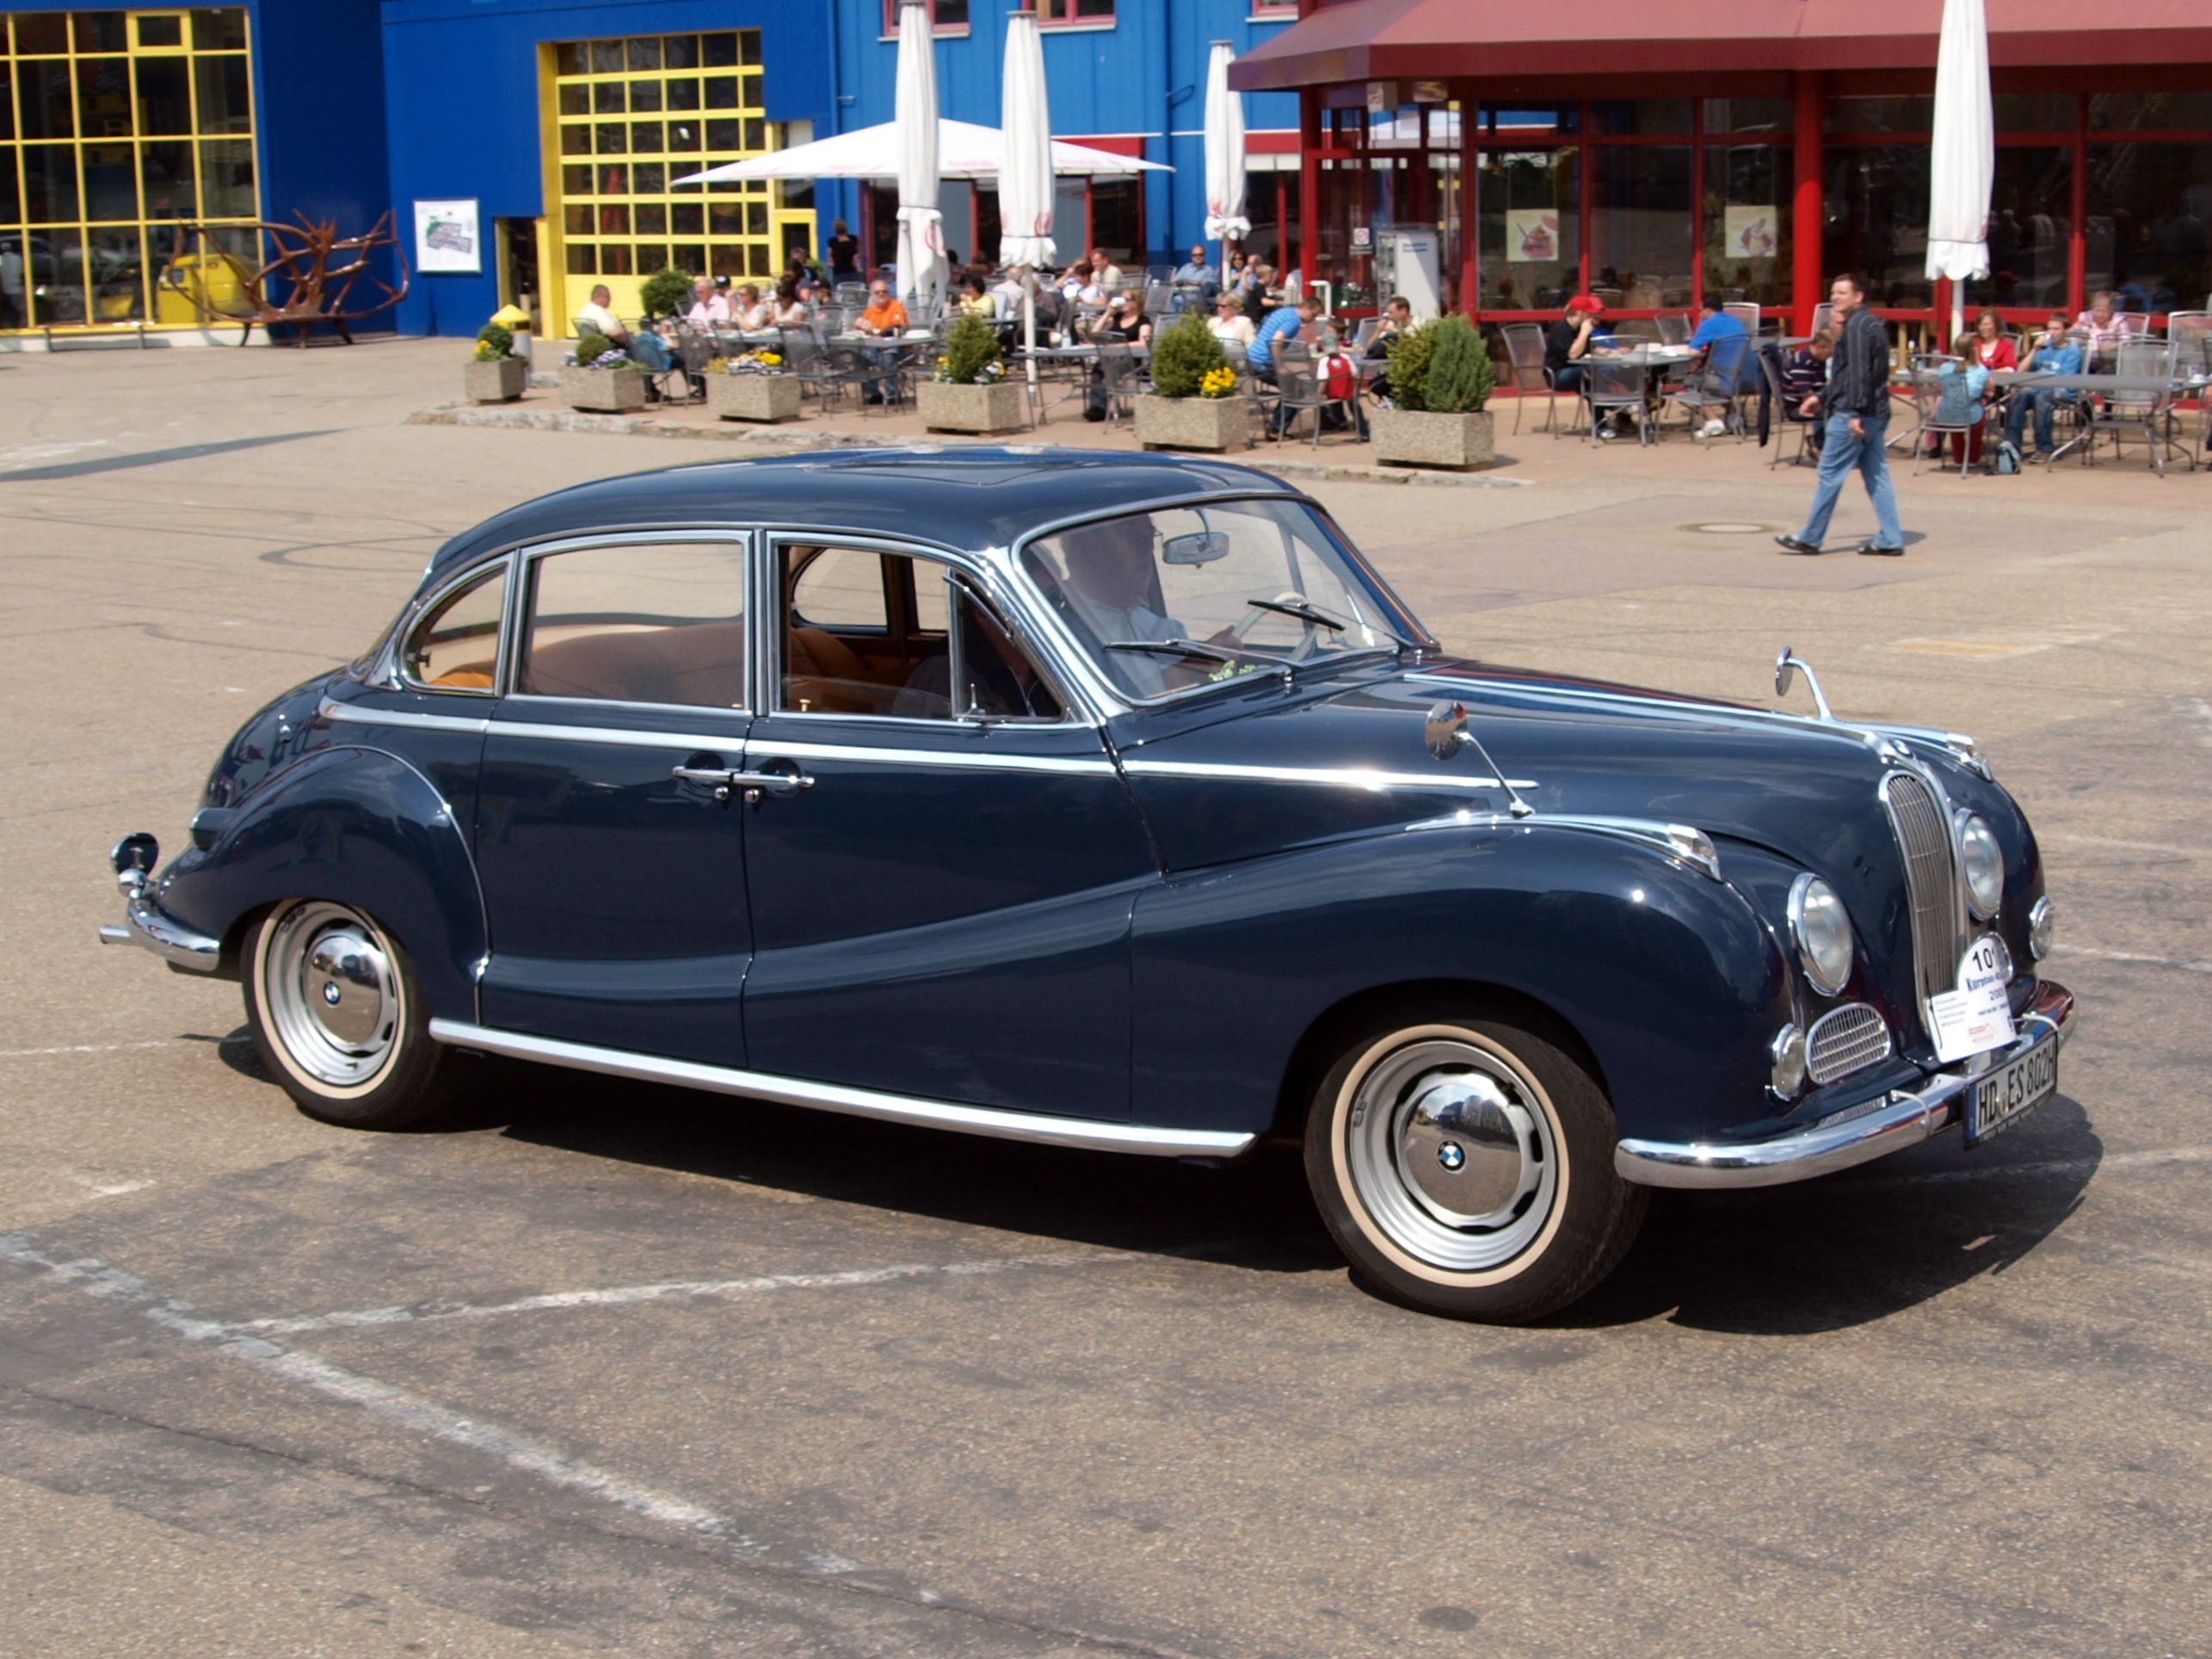 File:BMW 502 3200 Super (1963) p4.JPG - Wikimedia Commons